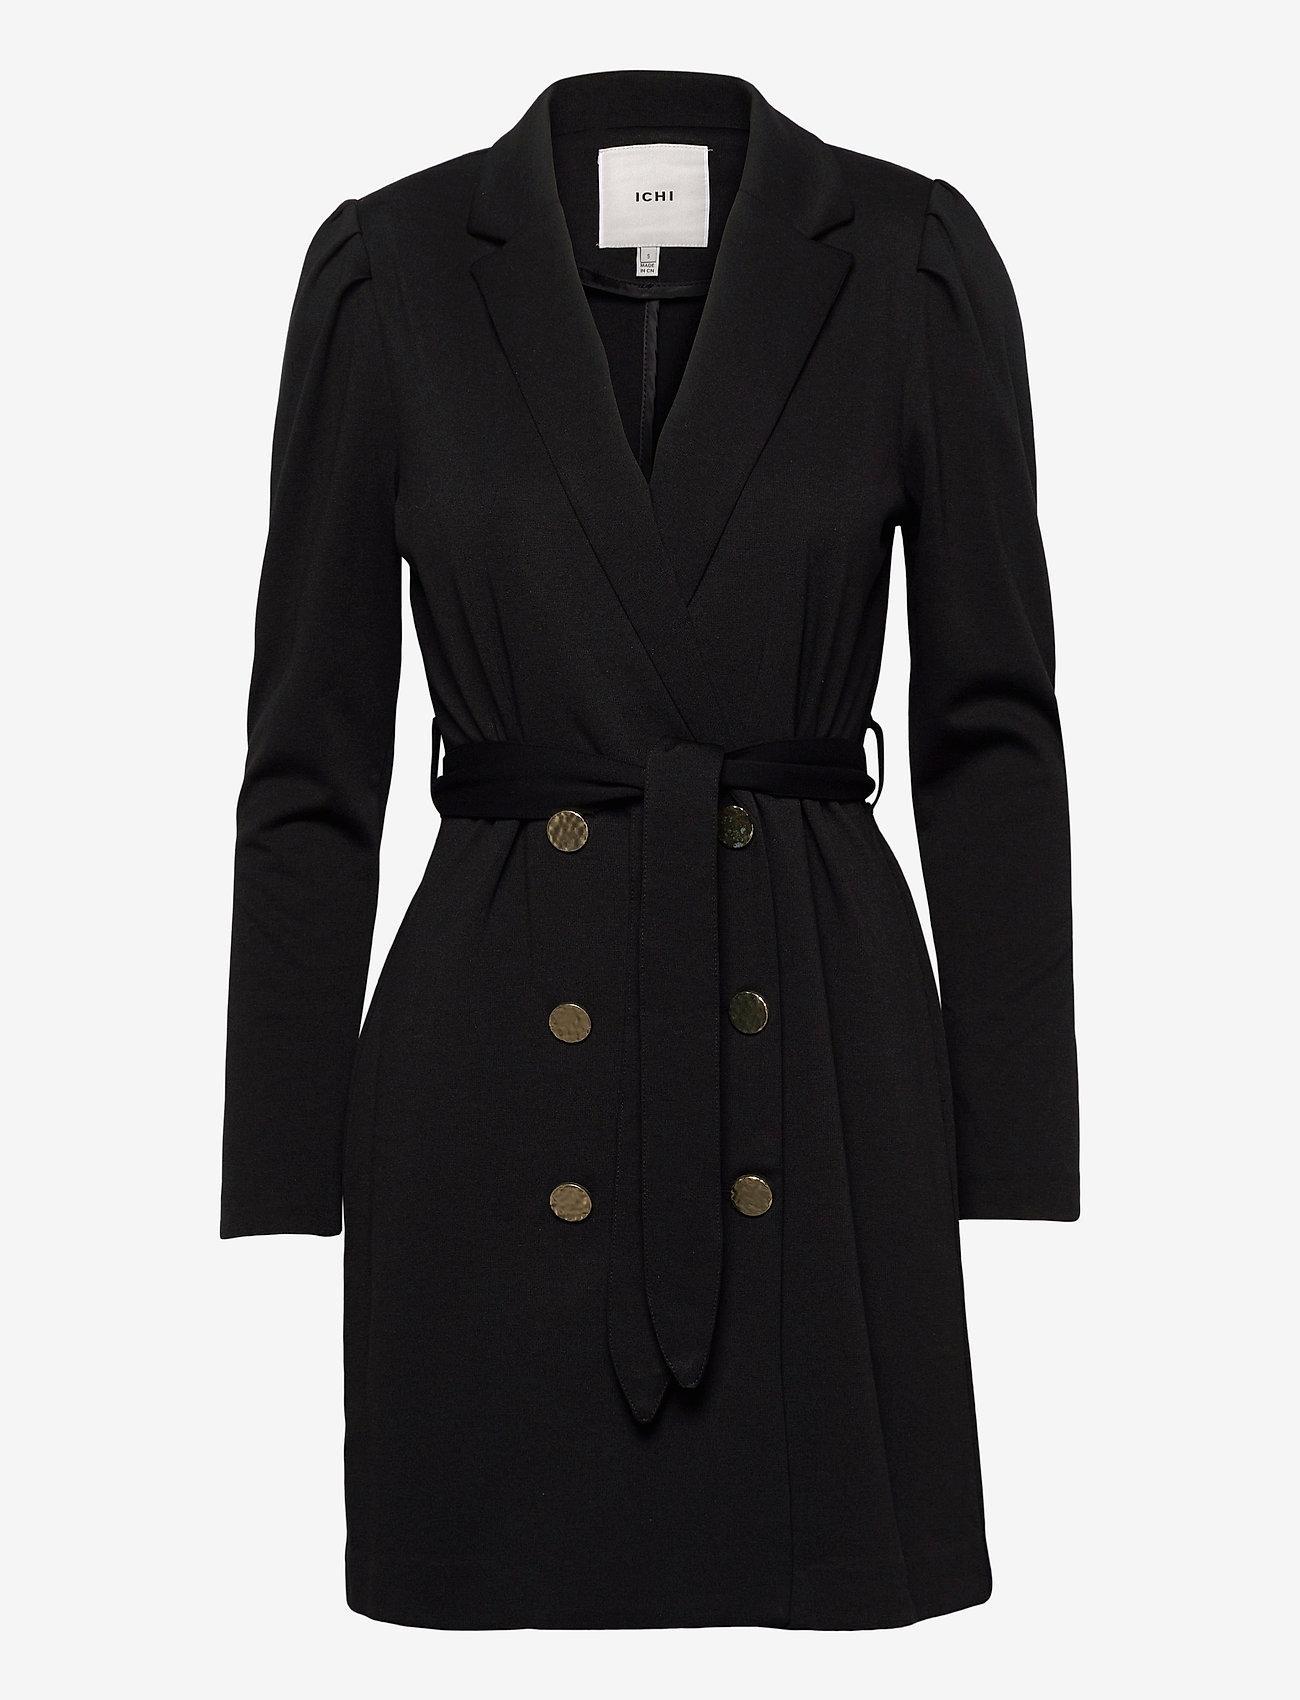 ICHI - IHKATE TREND DR7 - short dresses - black - 0